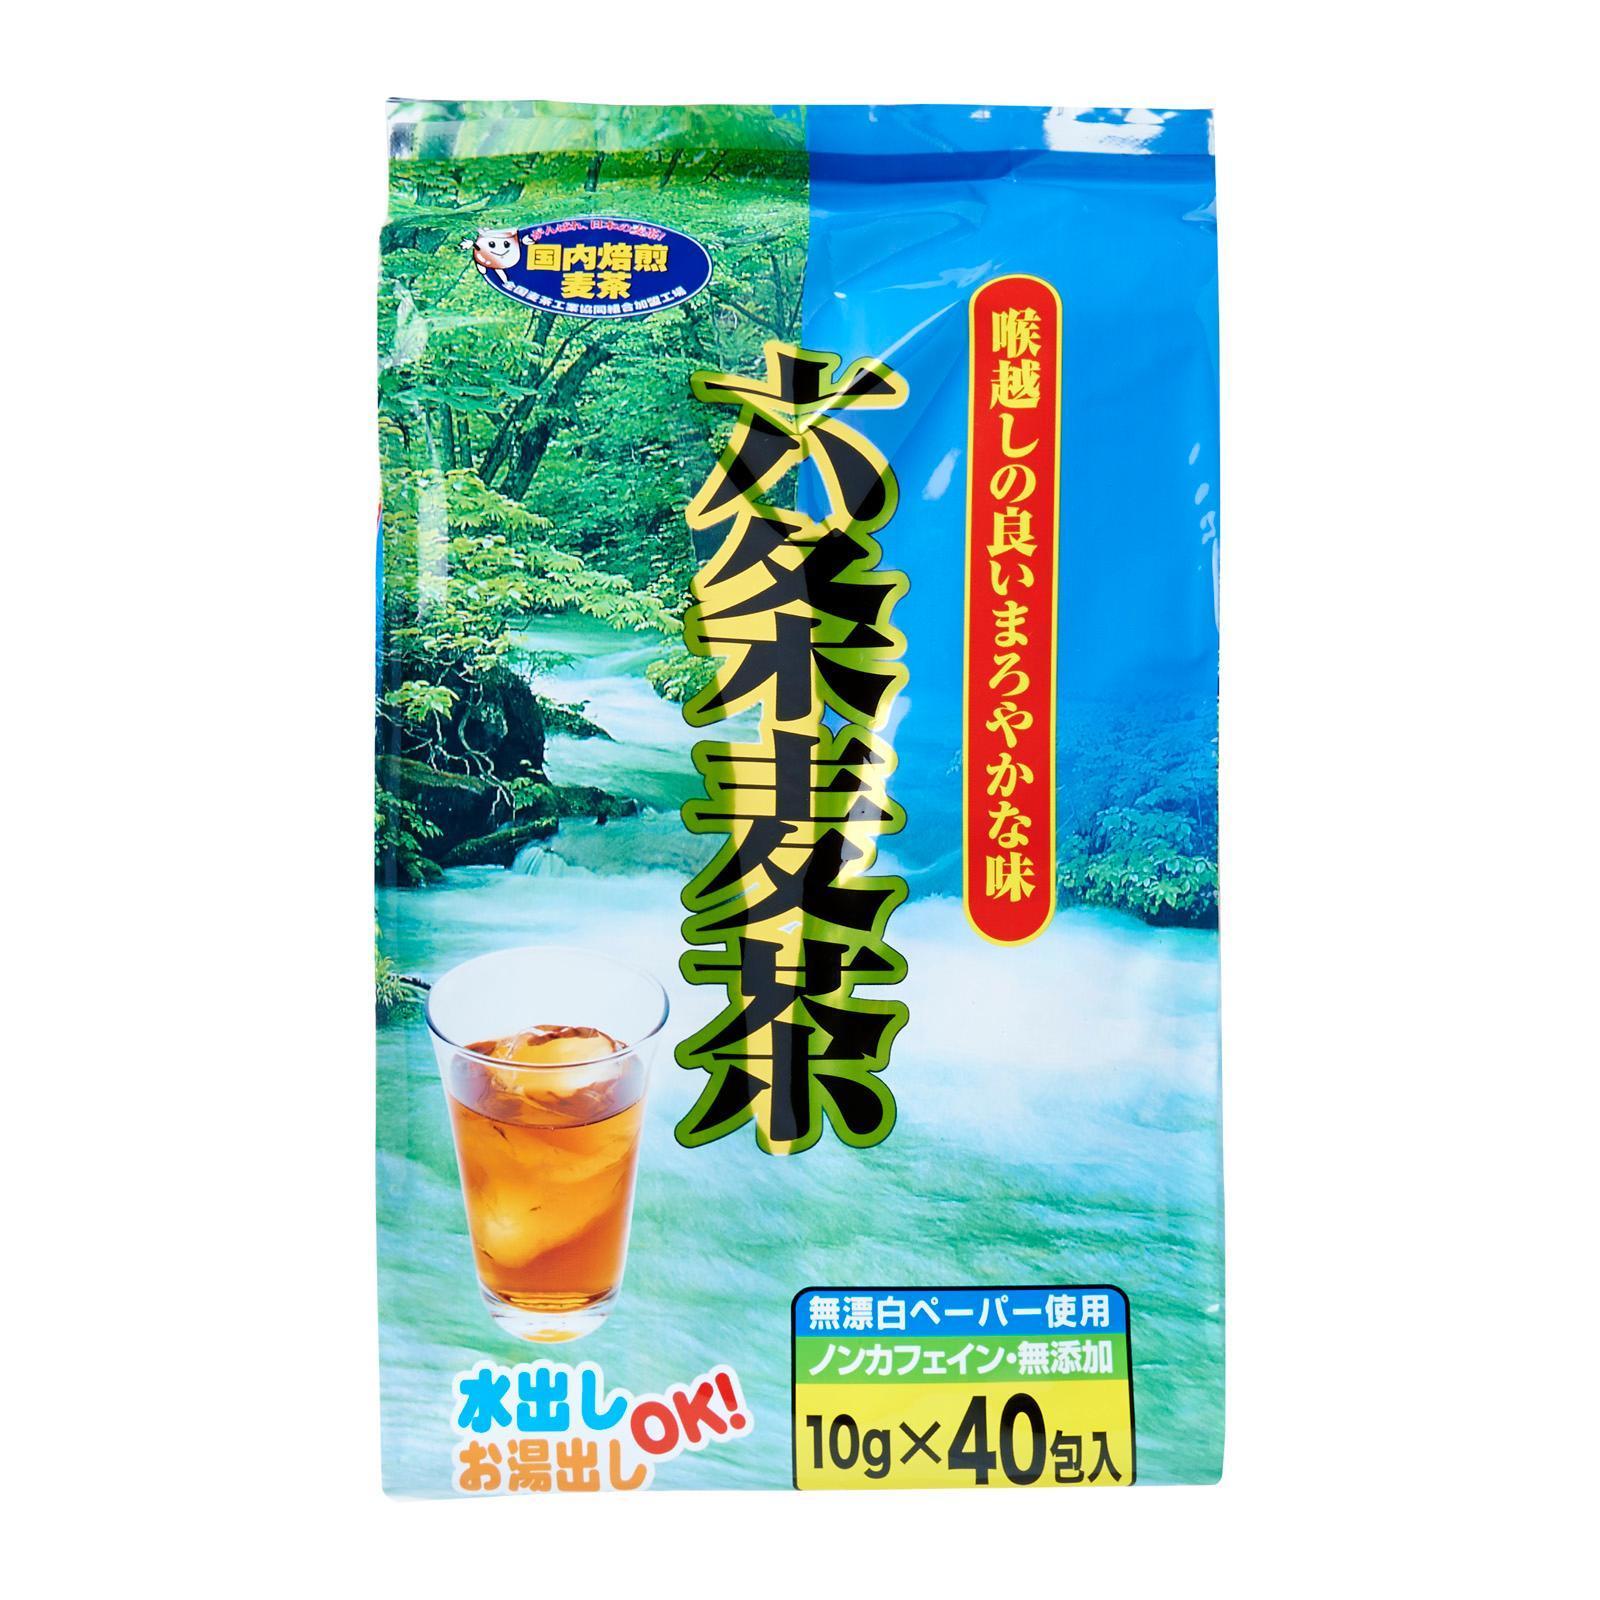 Kirei Mugi Cha Tea Bag